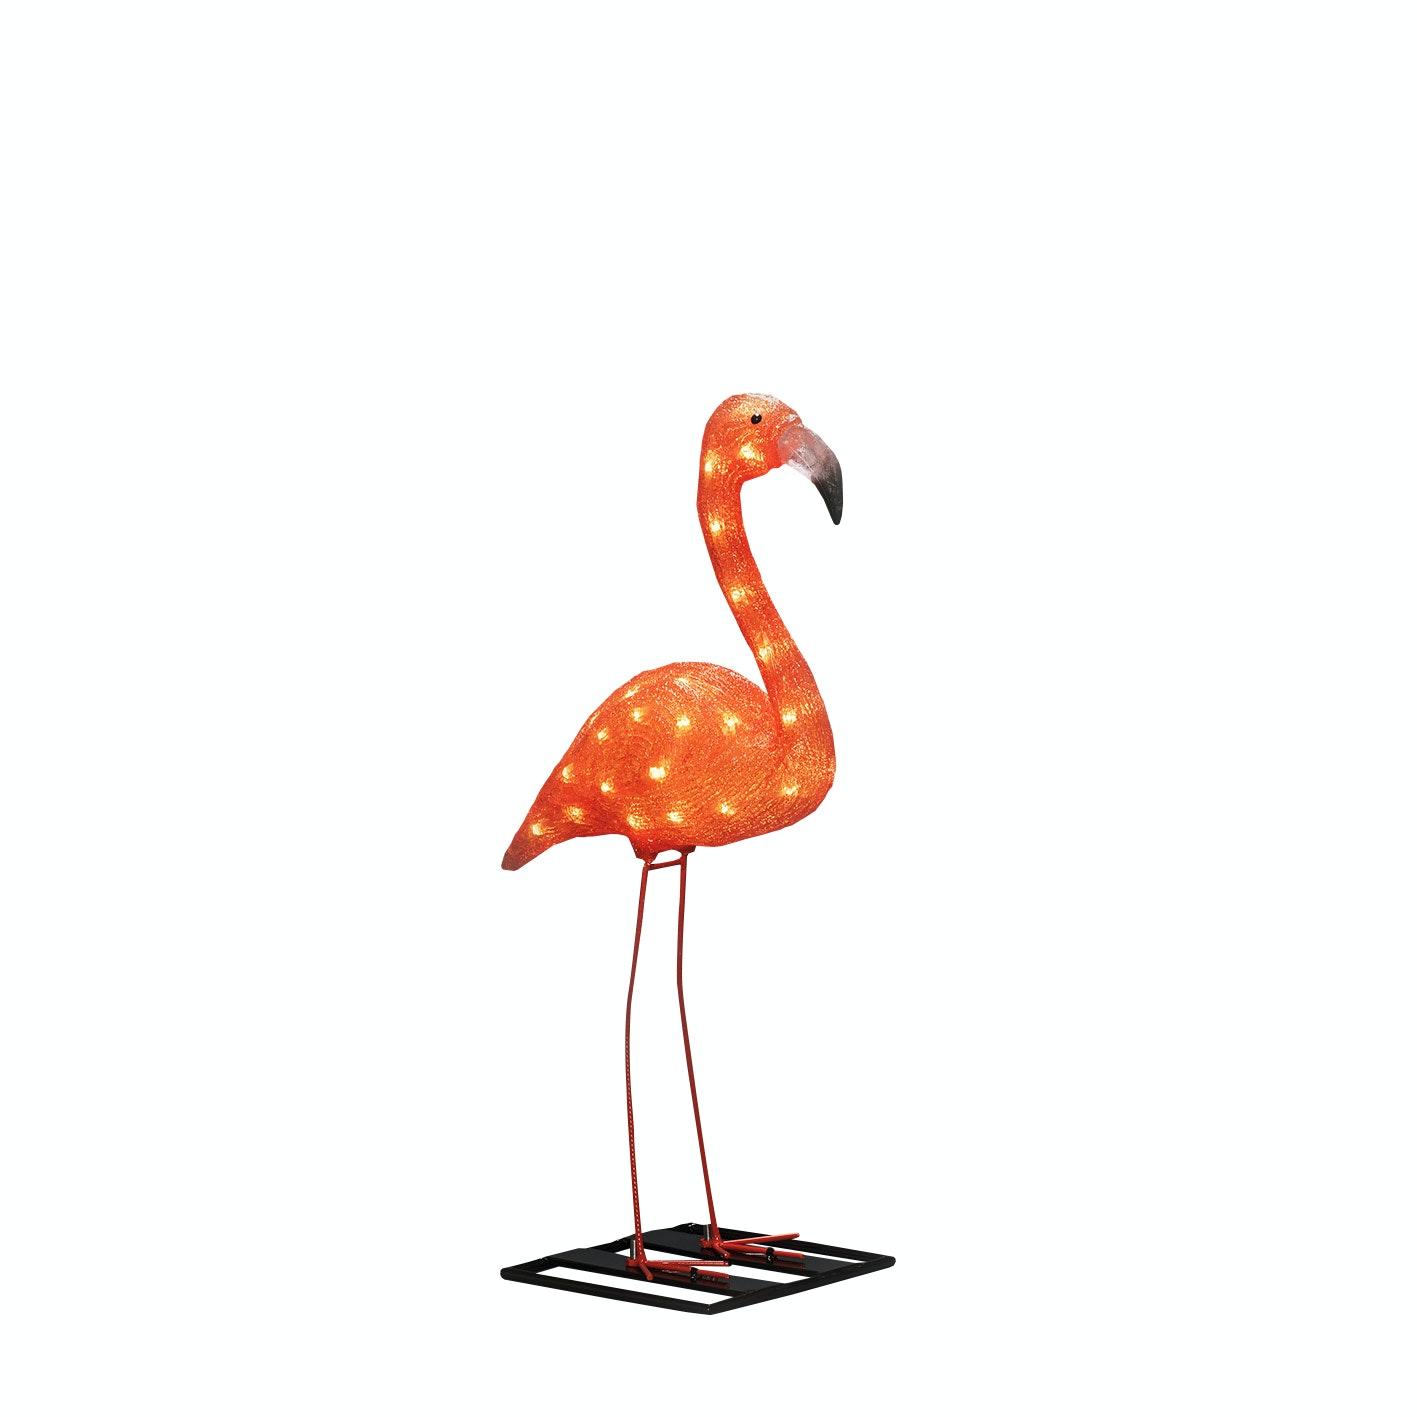 Trädgårdsbelysning Konstsmide Flamingo 70cm